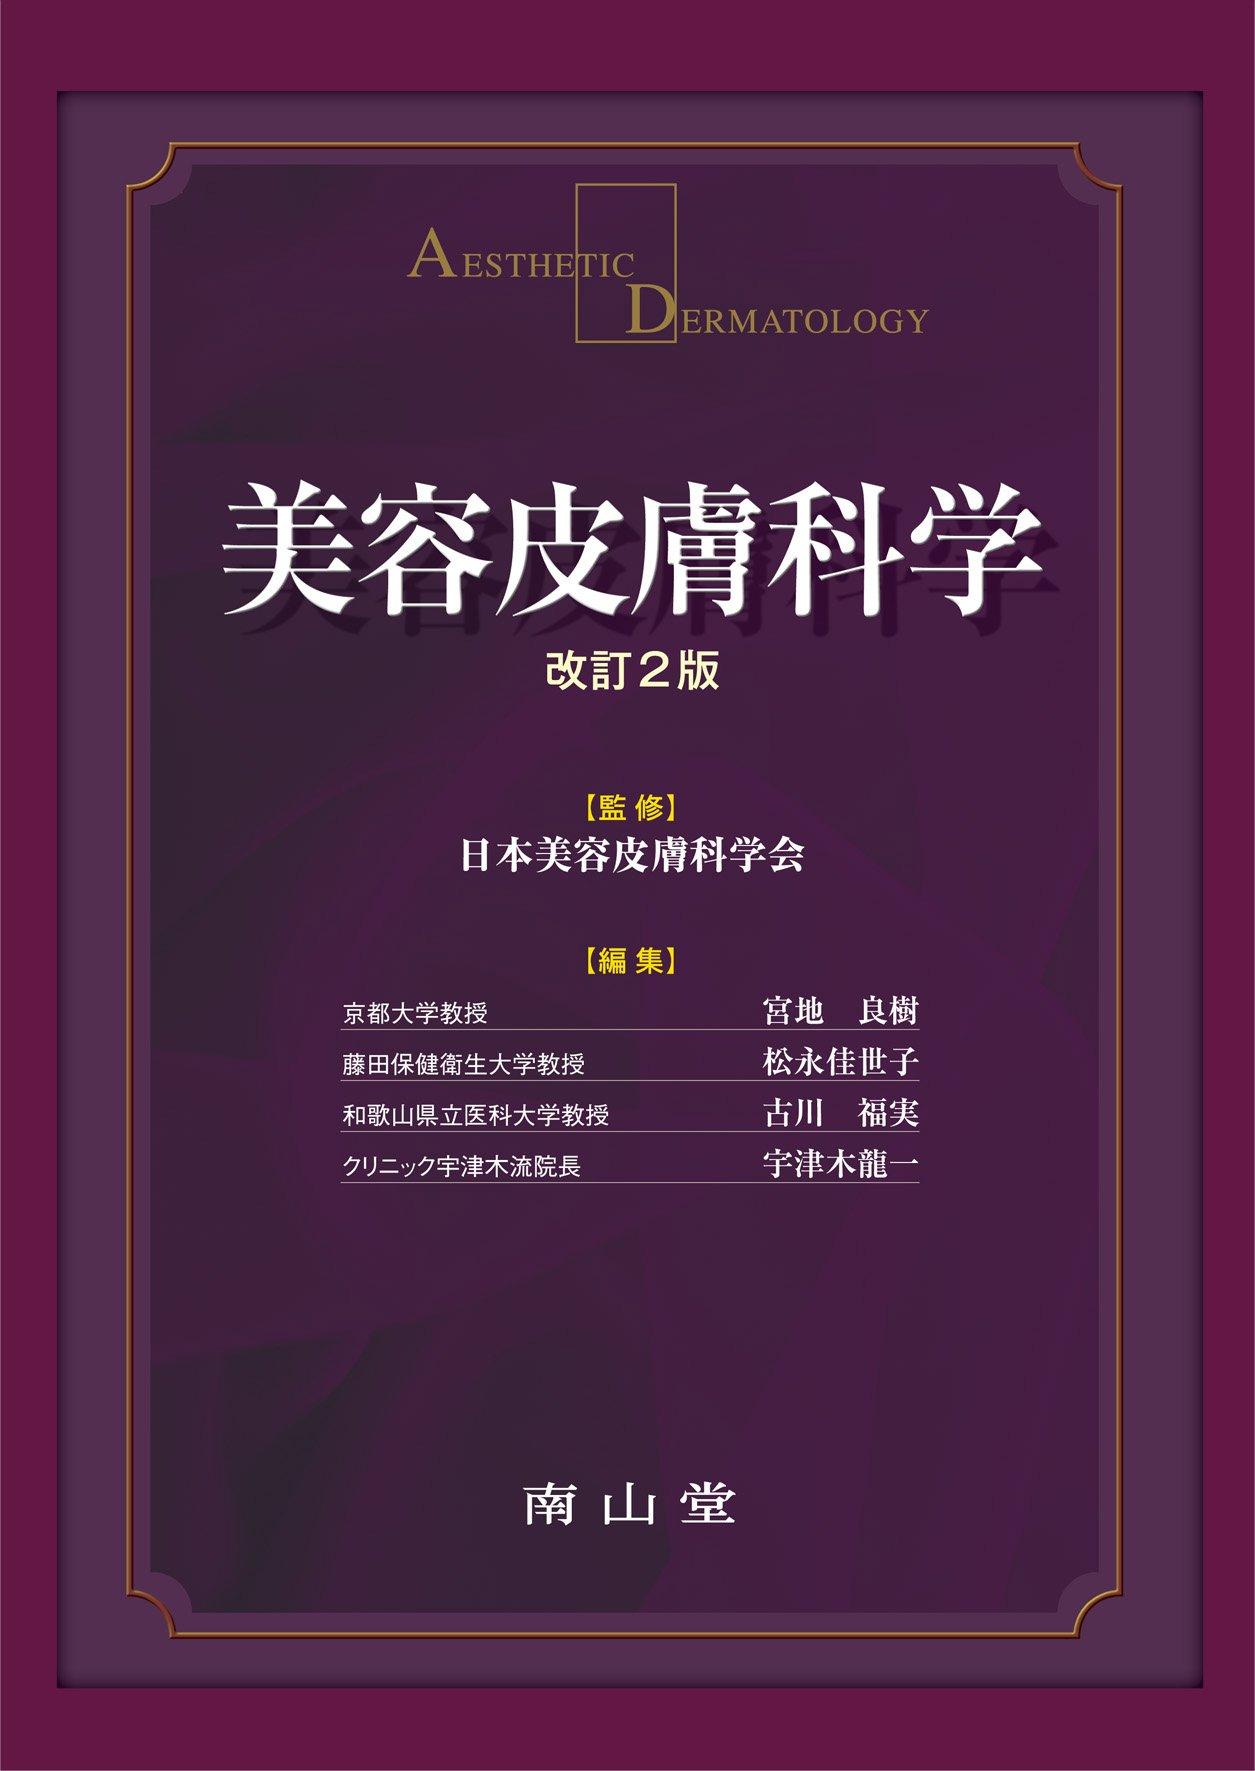 "BiyoÌ"" hifu kagaku = Aesthetic dermatology PDF"